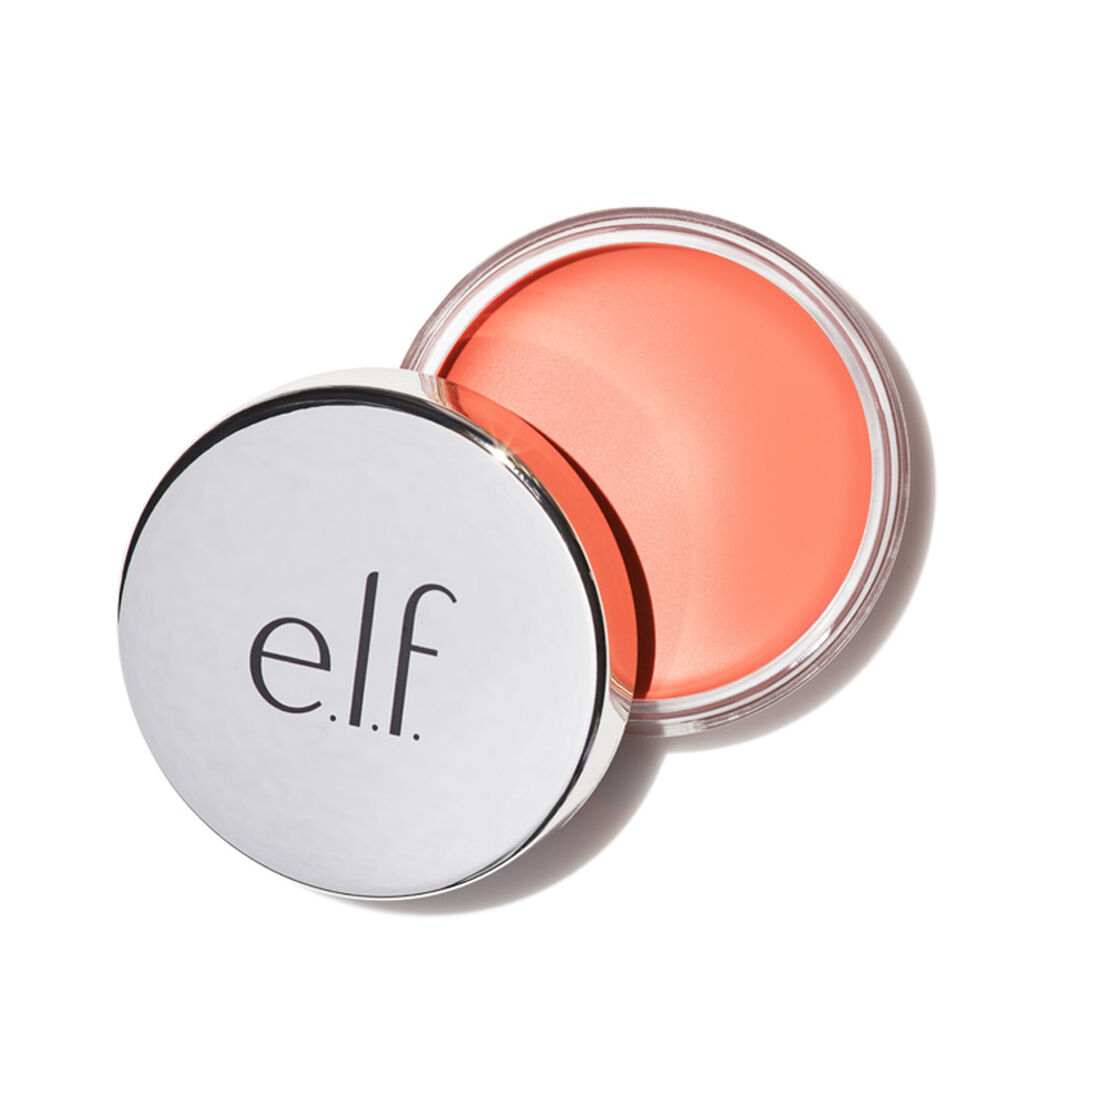 E.l.f Cosmetics - Beautifully Bare Cheeky Glow